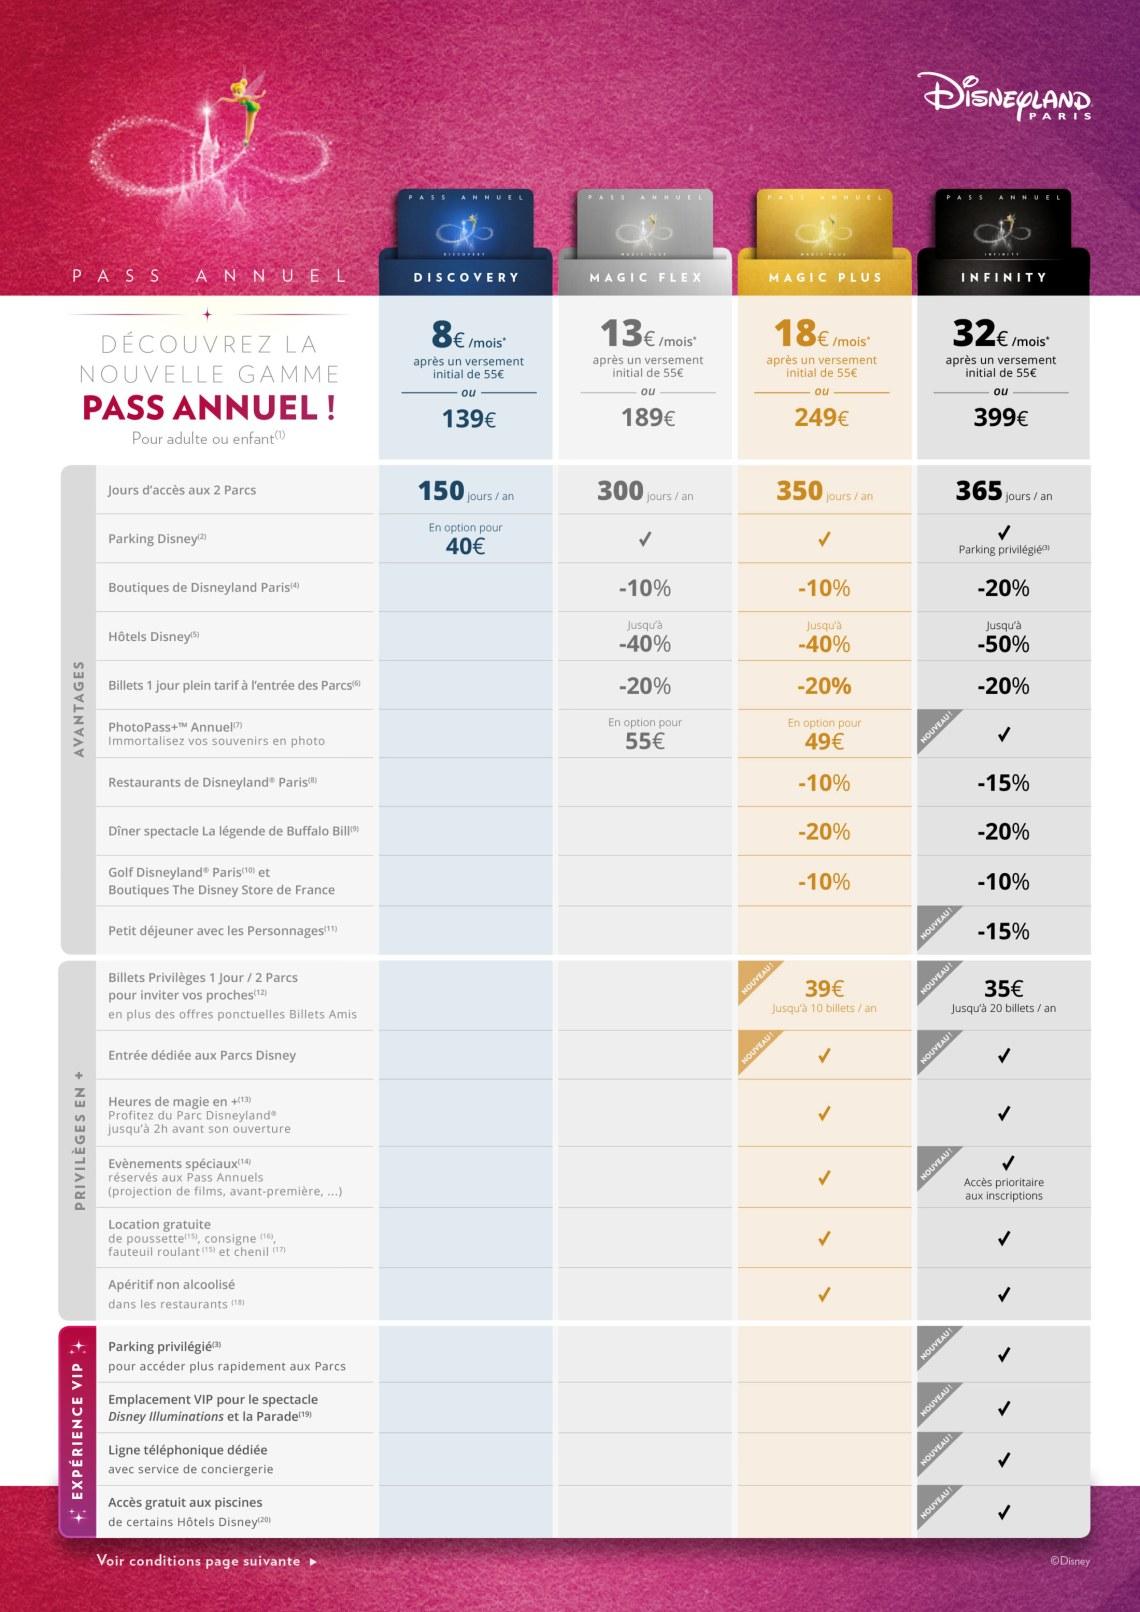 pass annuel disneyland paris prix 2017